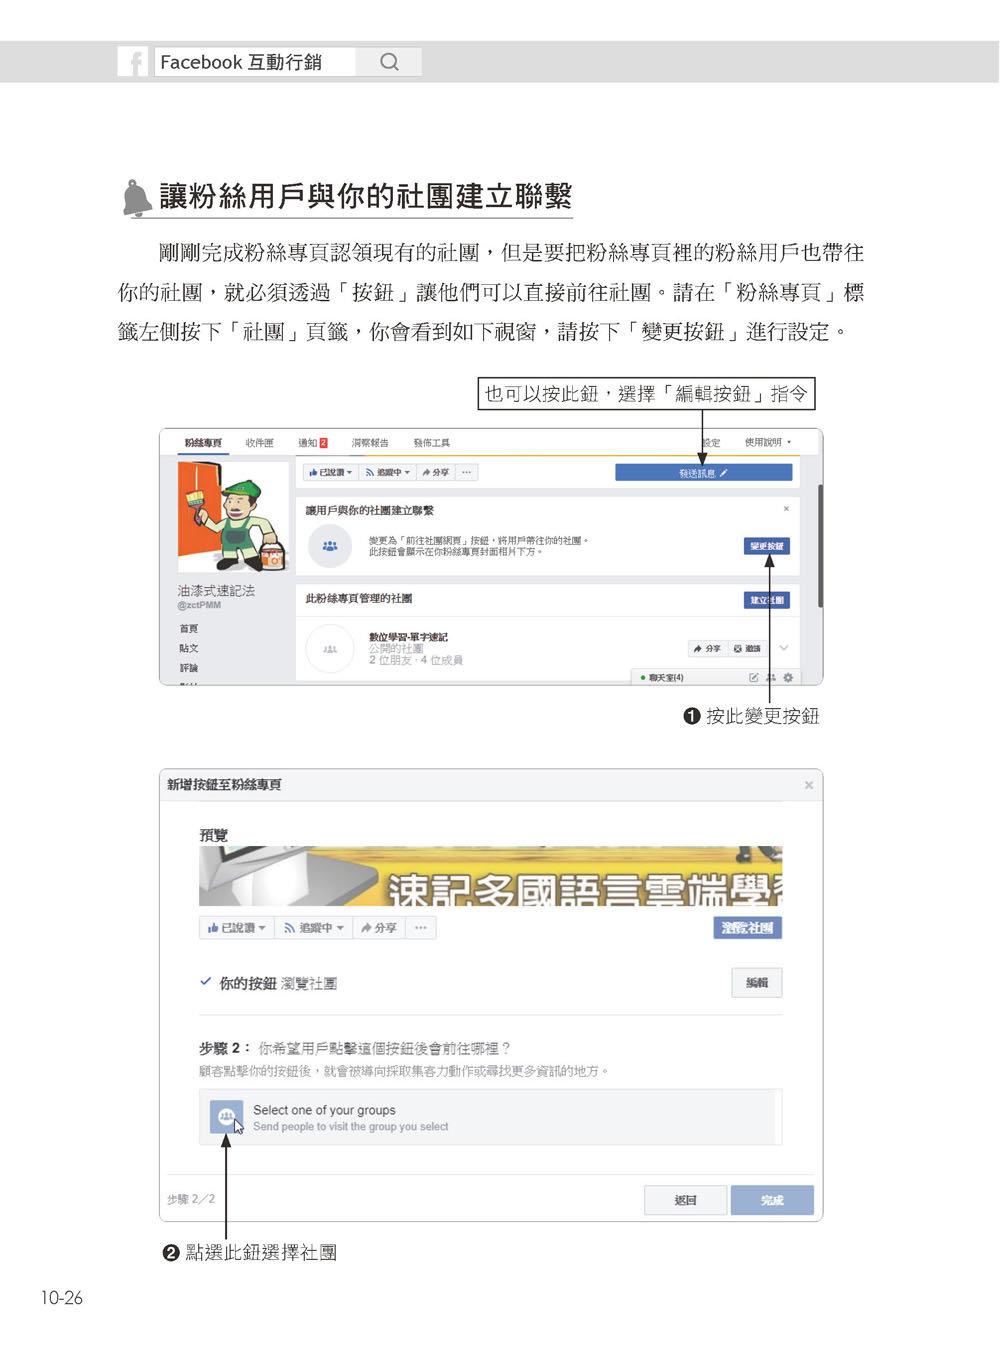 Facebook 互動行銷:社群口碑經營新思路+廣告投放如何有成效,想做好臉書行銷,操作心法就在這!-preview-30